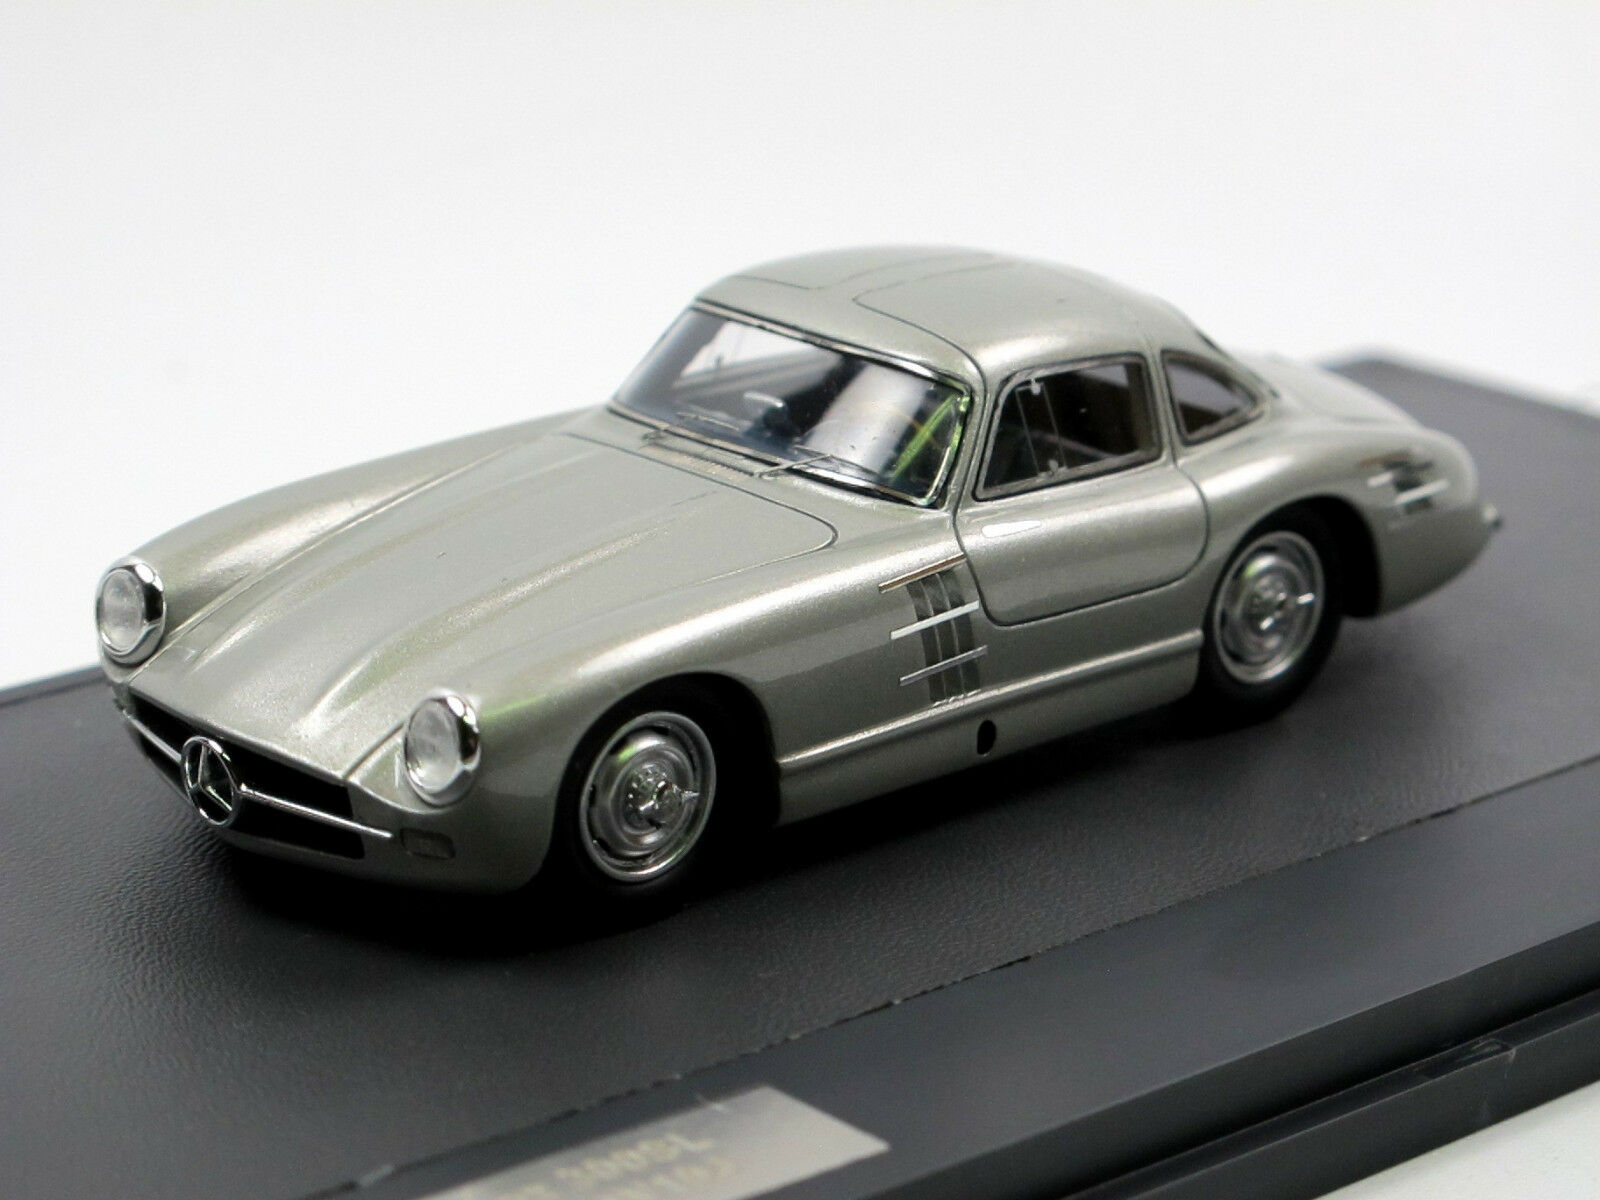 Matrix 1953 Mercedes-Benz 300 SL W194 11 Transaxle Transaxle Transaxle Predotype  Hobel  1 43 ff2d32